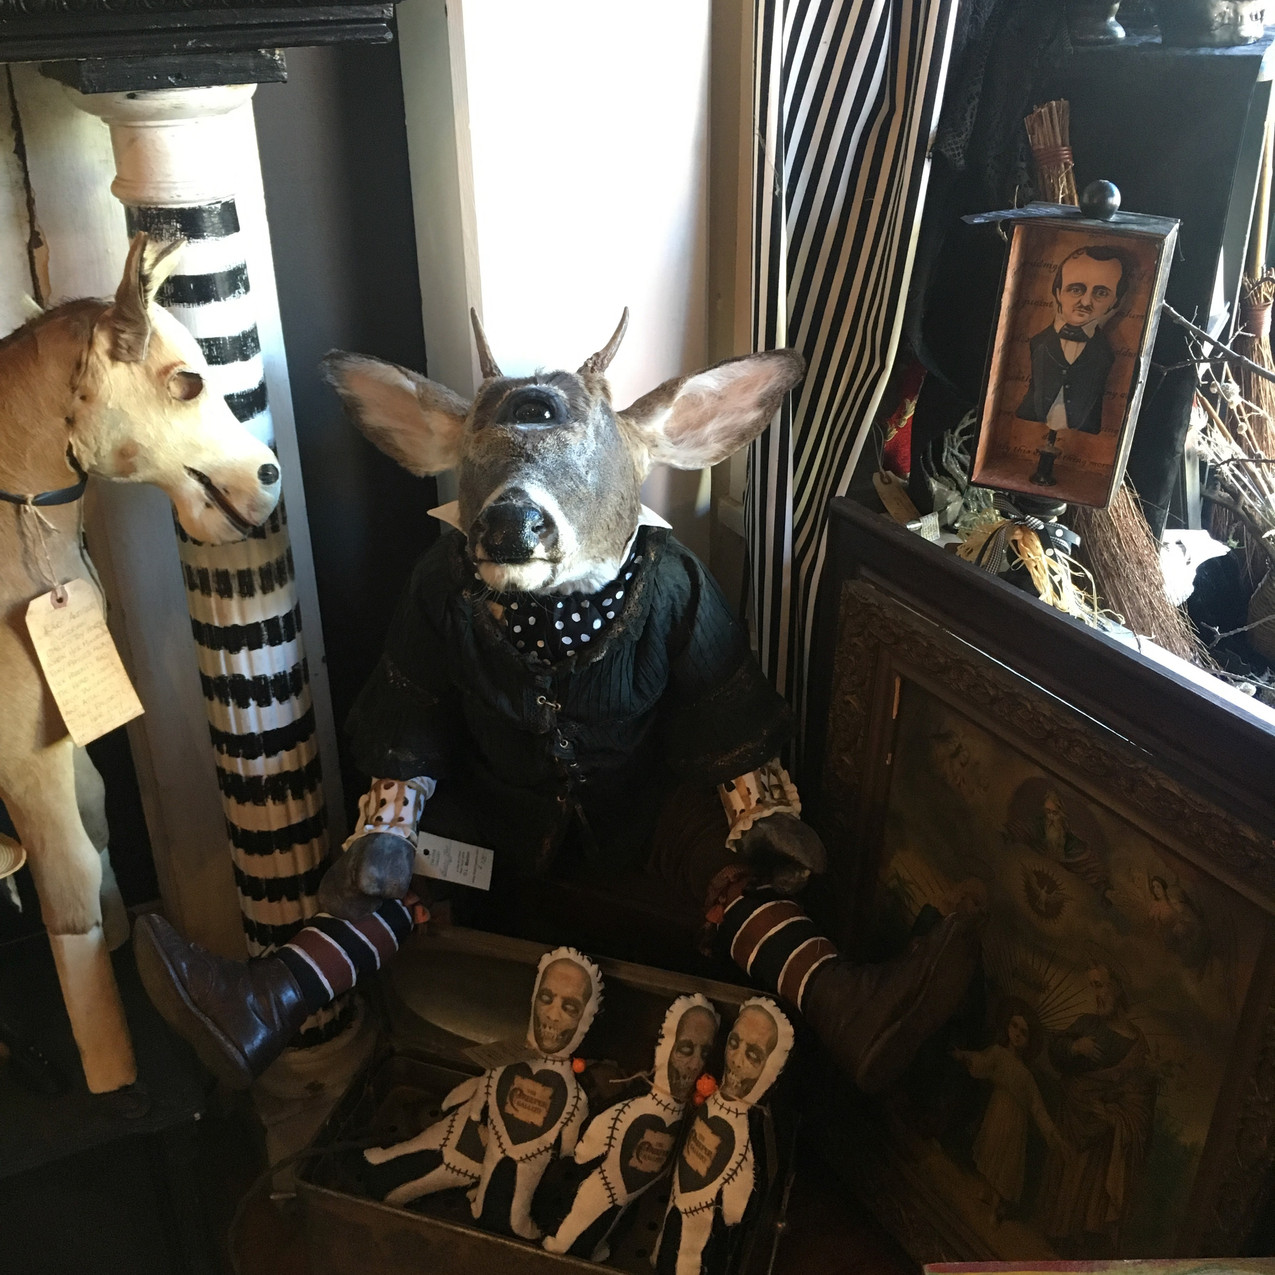 Cyclops goat at Creeper Gallery